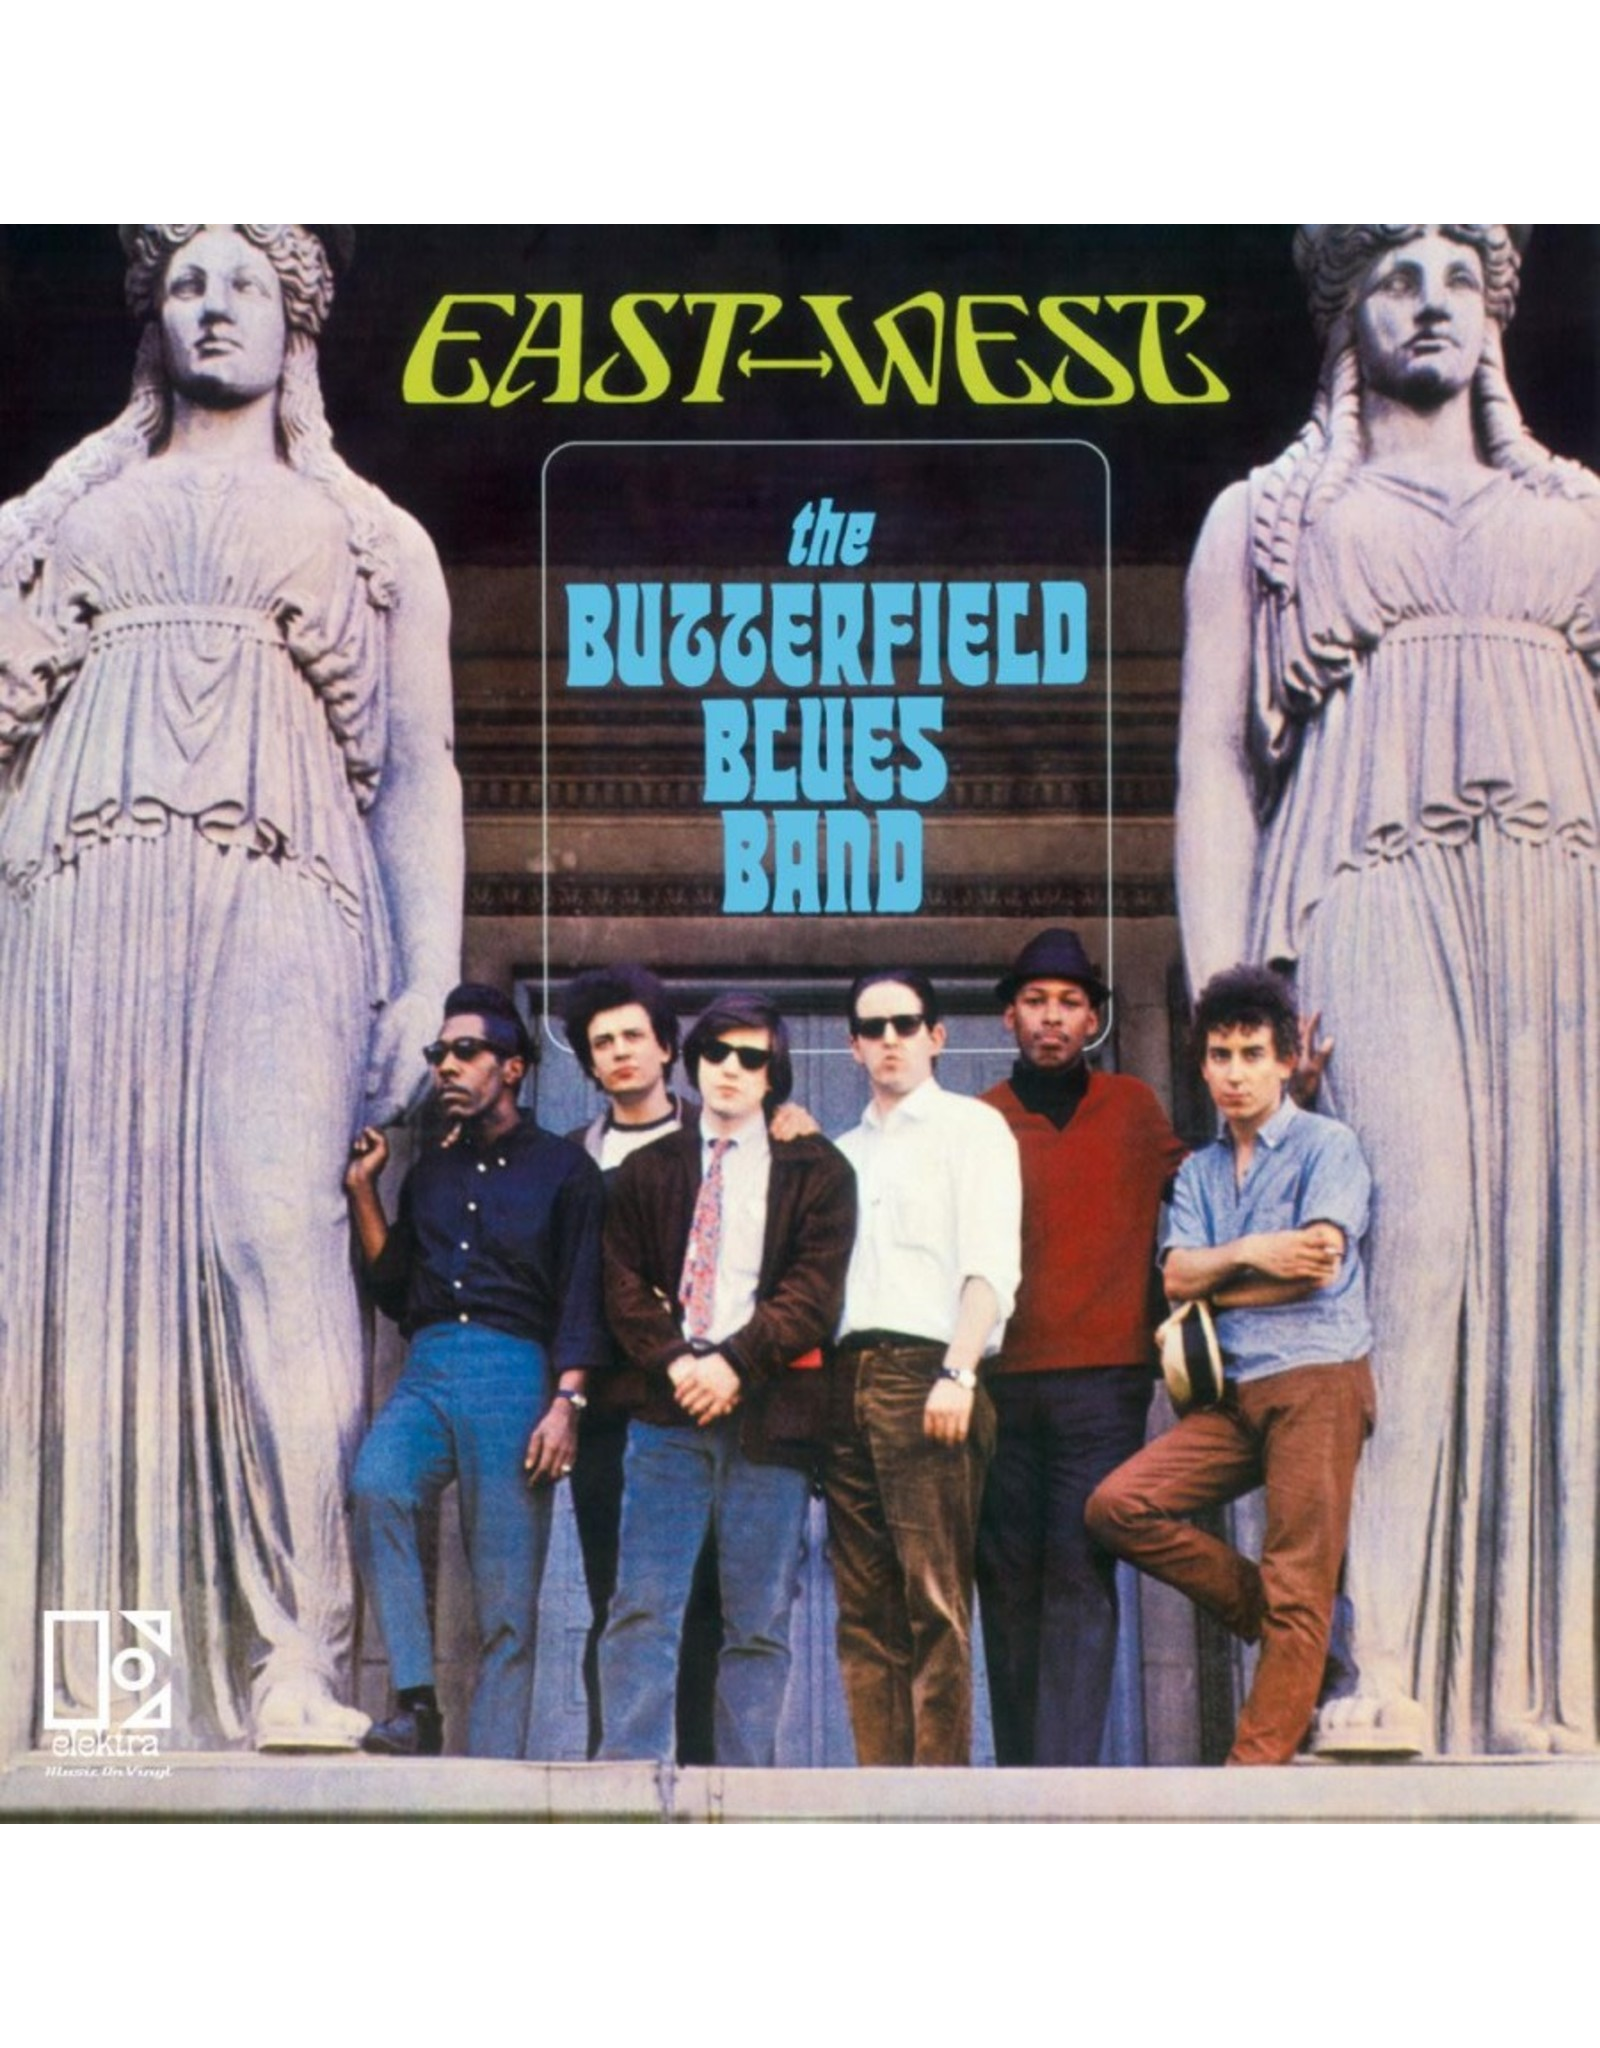 Butterfield Blues Band - East-West LP